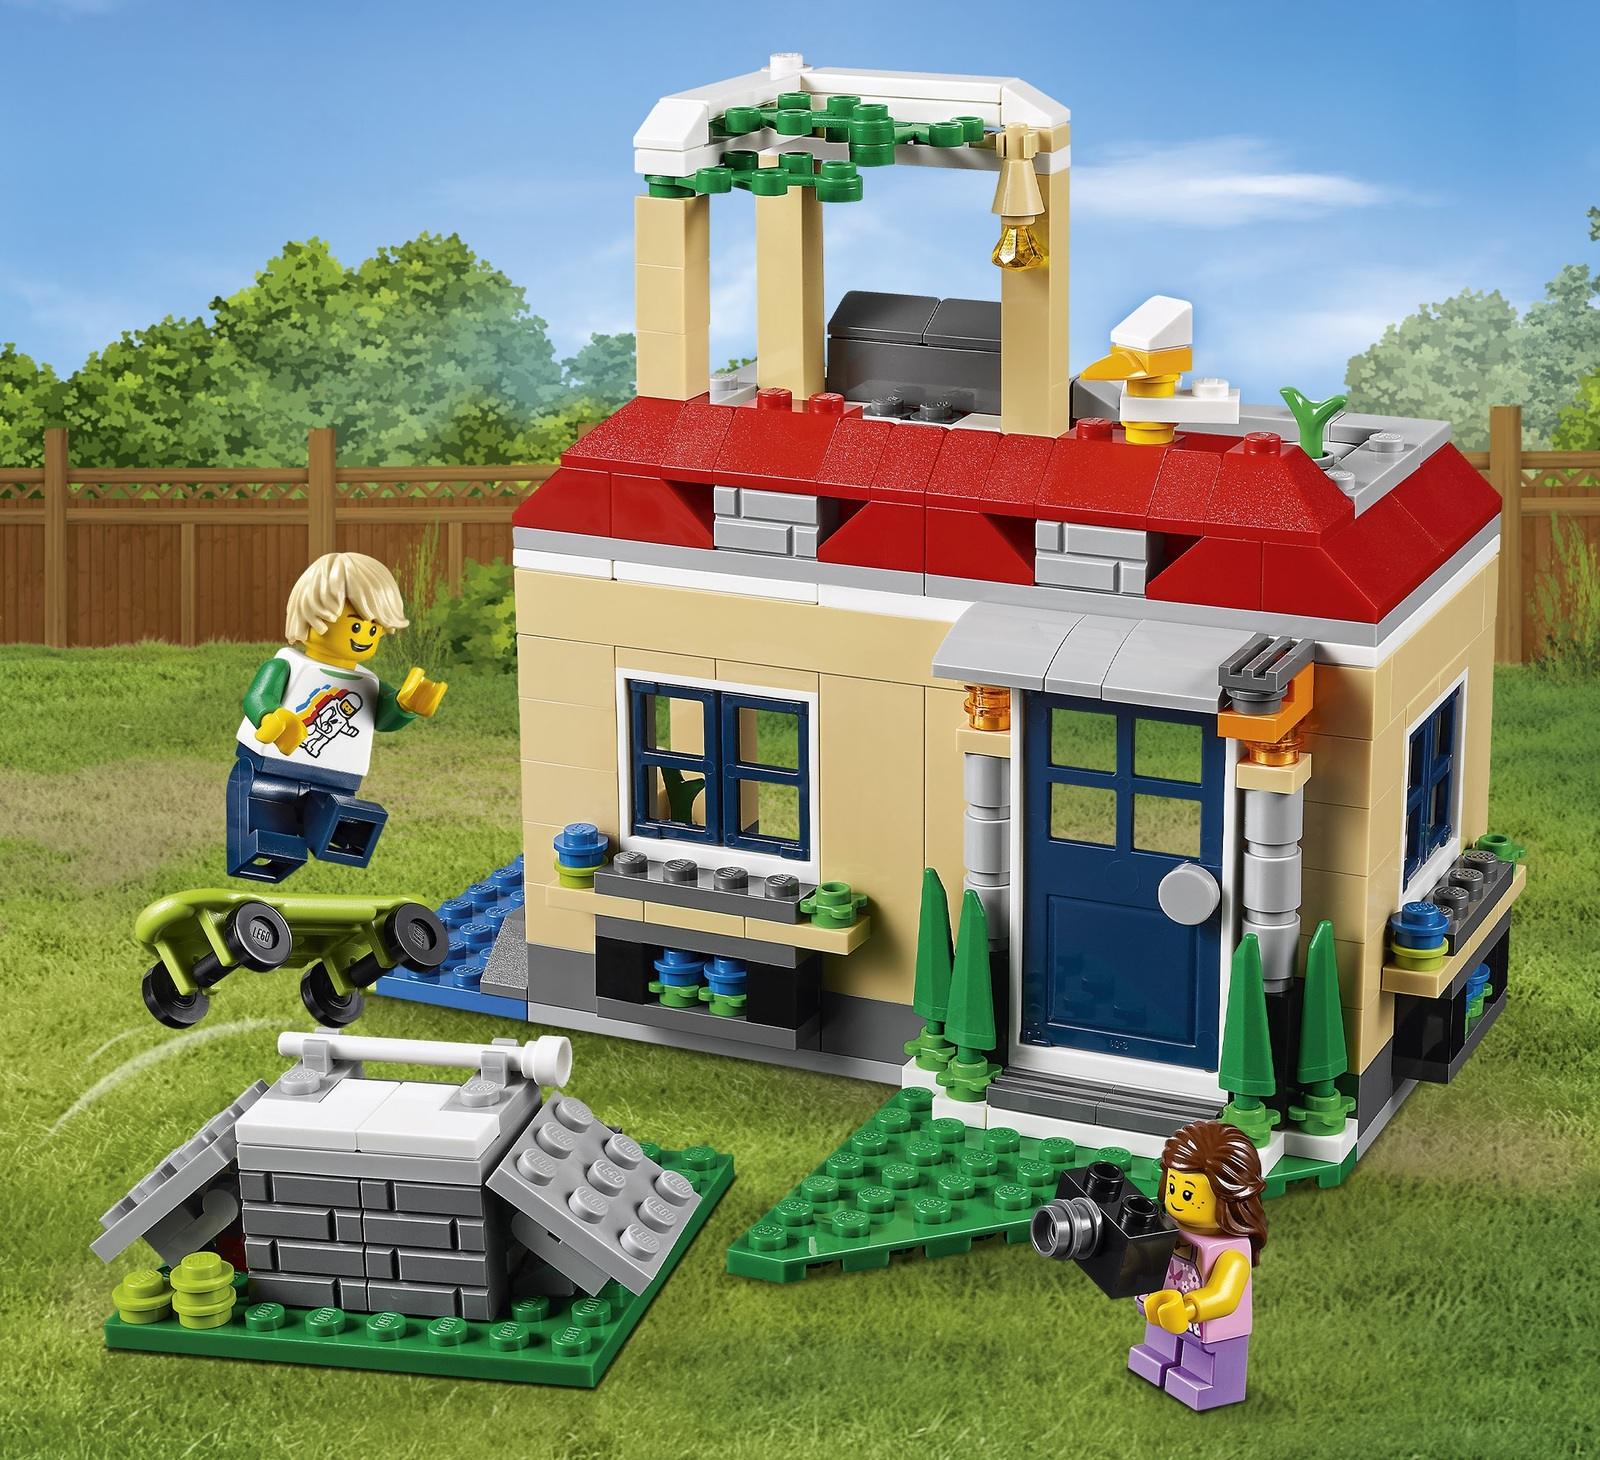 LEGO Creator - Poolside Holiday (31067) image